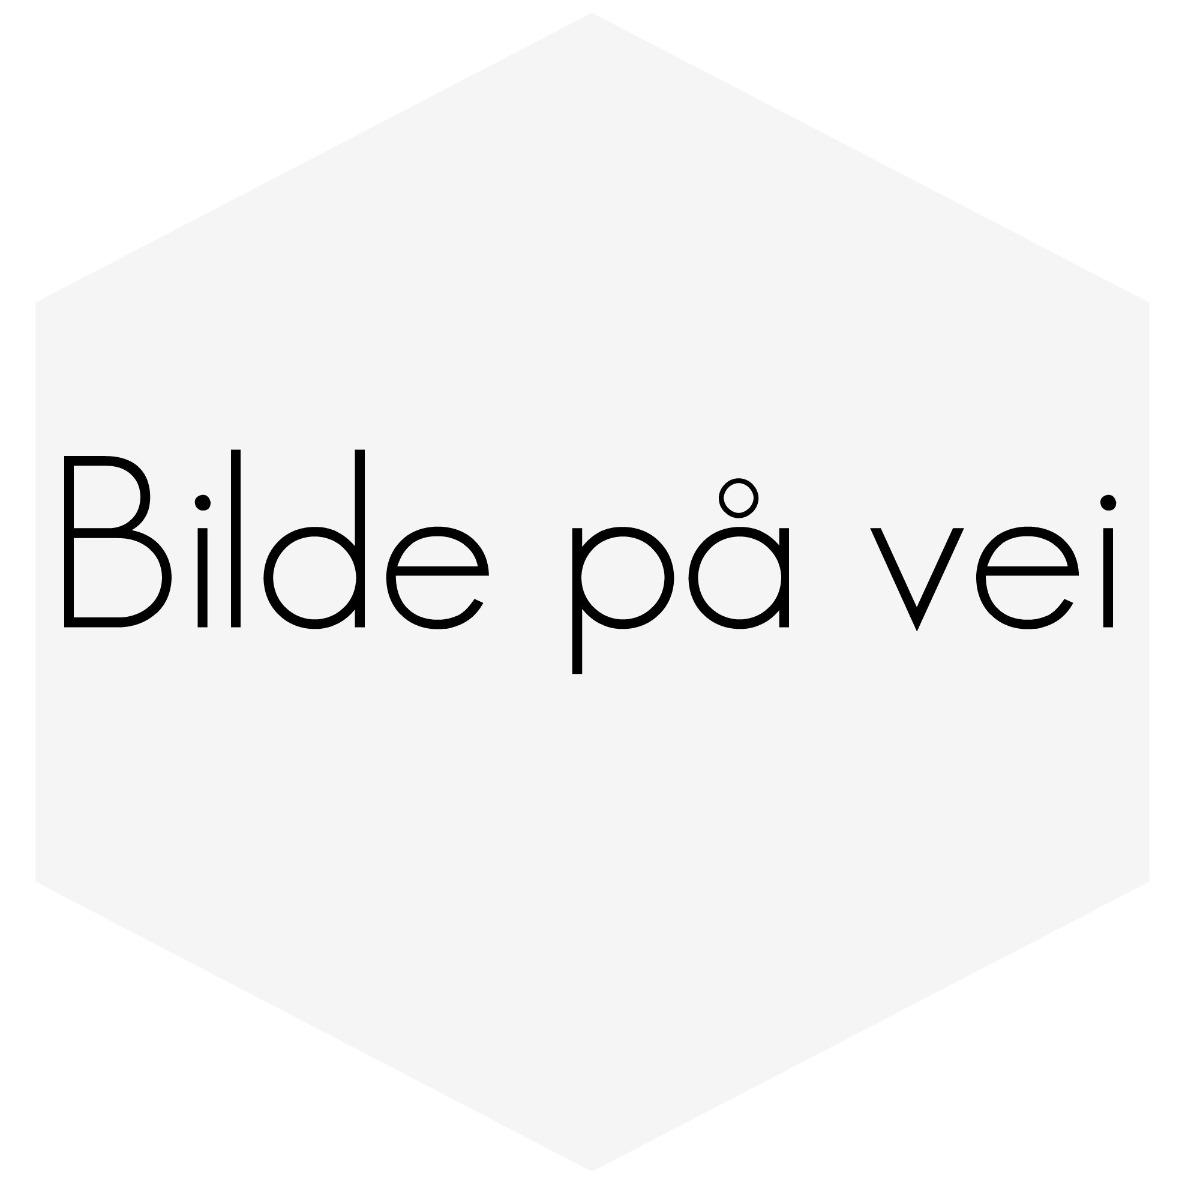 SILIKONSLANGE ARMERT SVART 0,75'' (19MM)